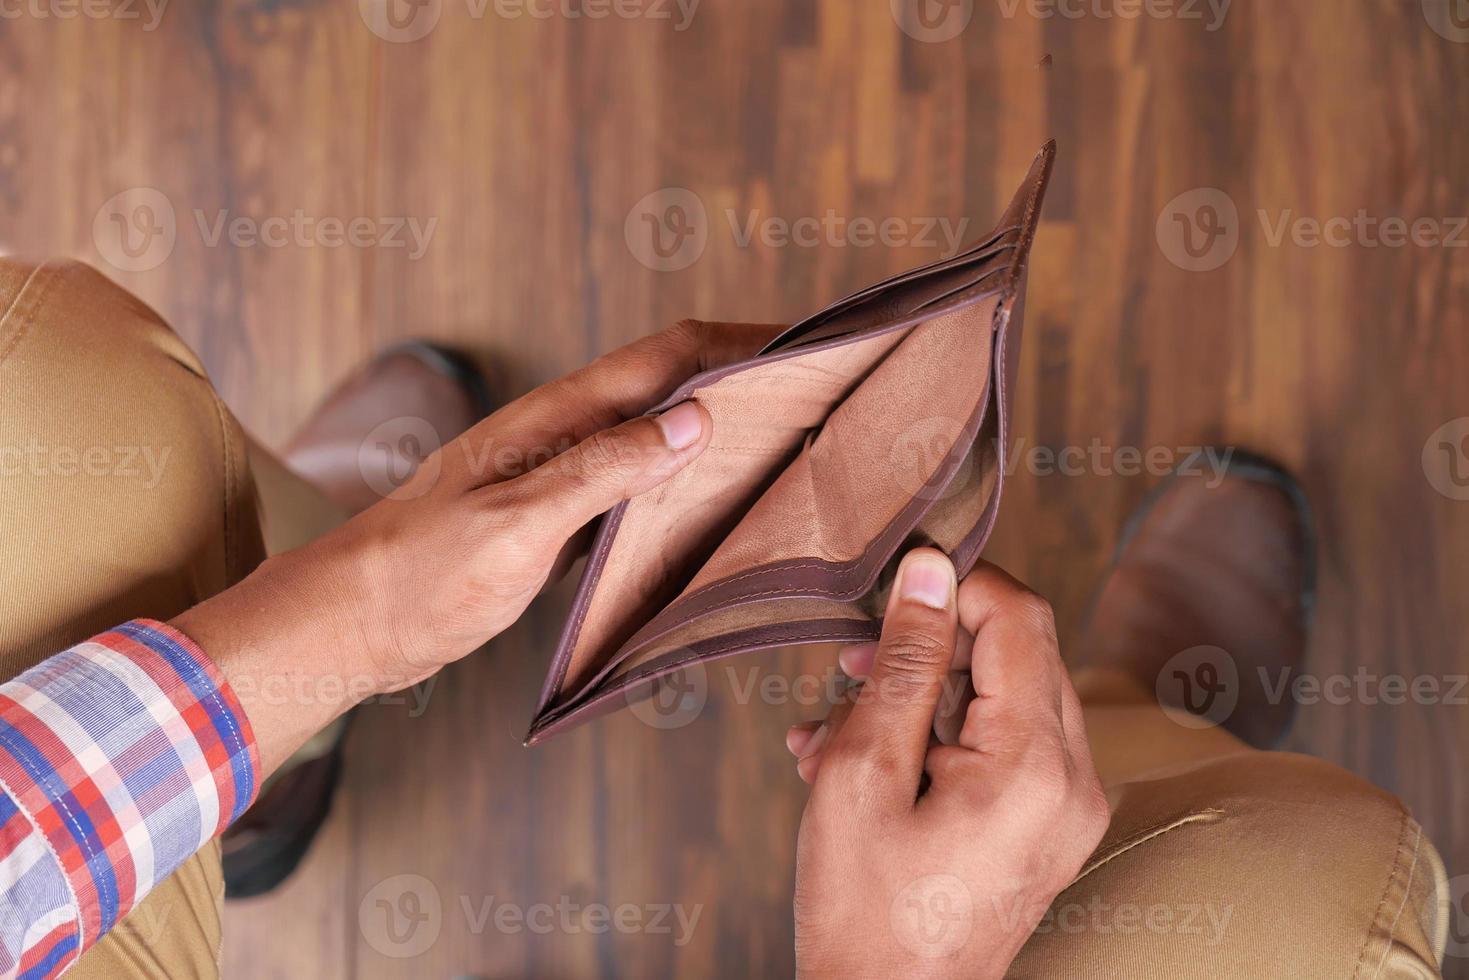 öppna tom plånbok med kopieringsutrymme foto